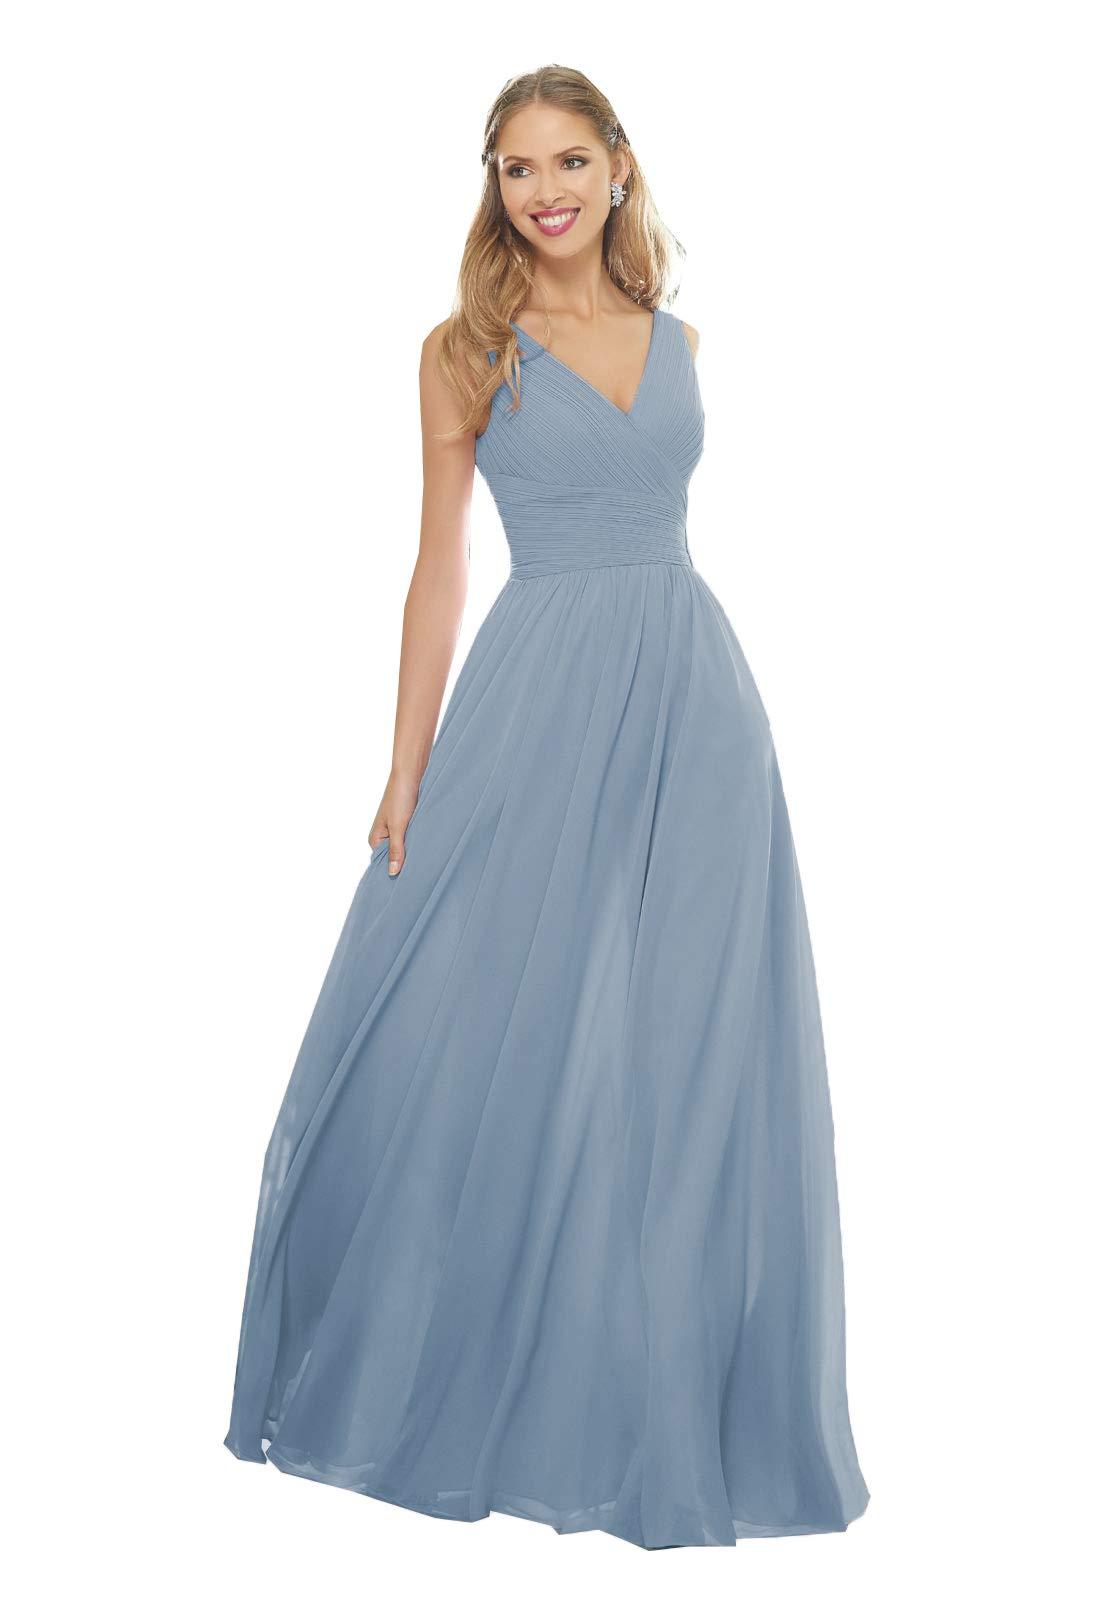 c133891c58 YMSHA Women's Beach Wedding Bridesmaid Dress Chiffon V Neck Evening Formal  Gowns with Pockets Slate Blue 14